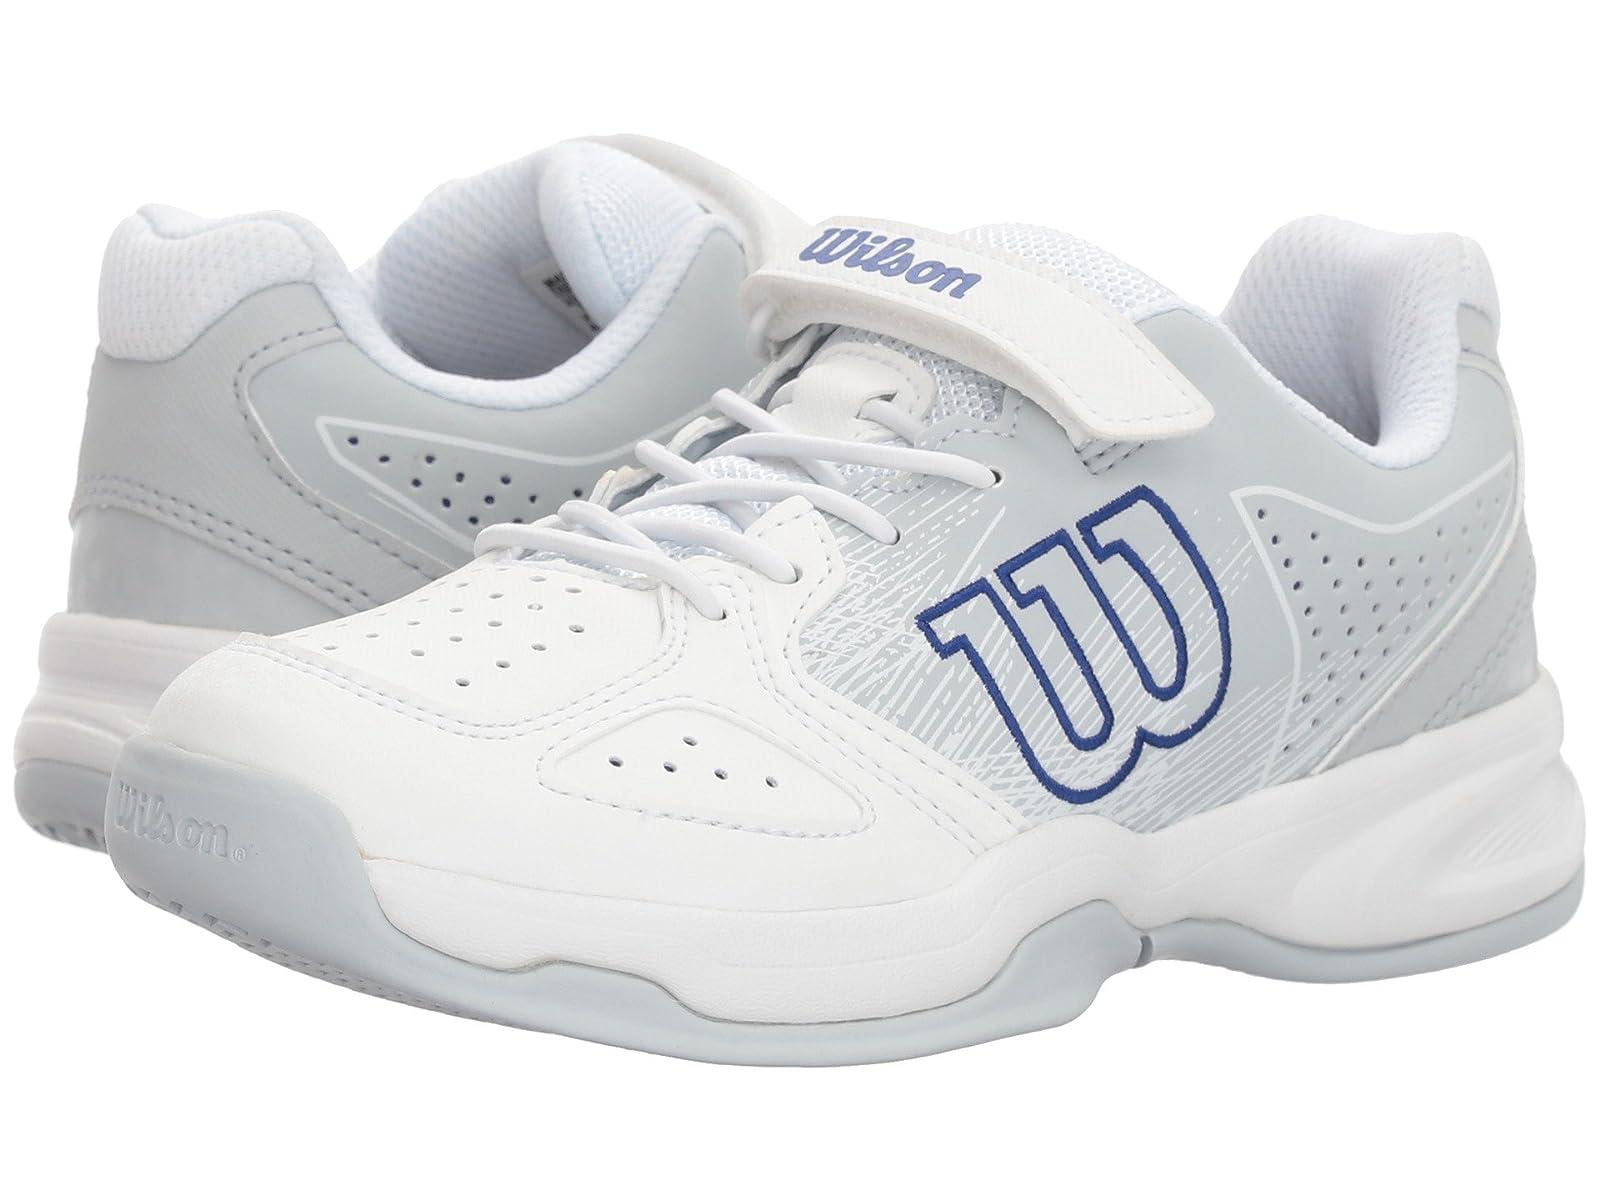 Wilson Kids Stroke K Tennis (Little Kid)Atmospheric grades have affordable shoes